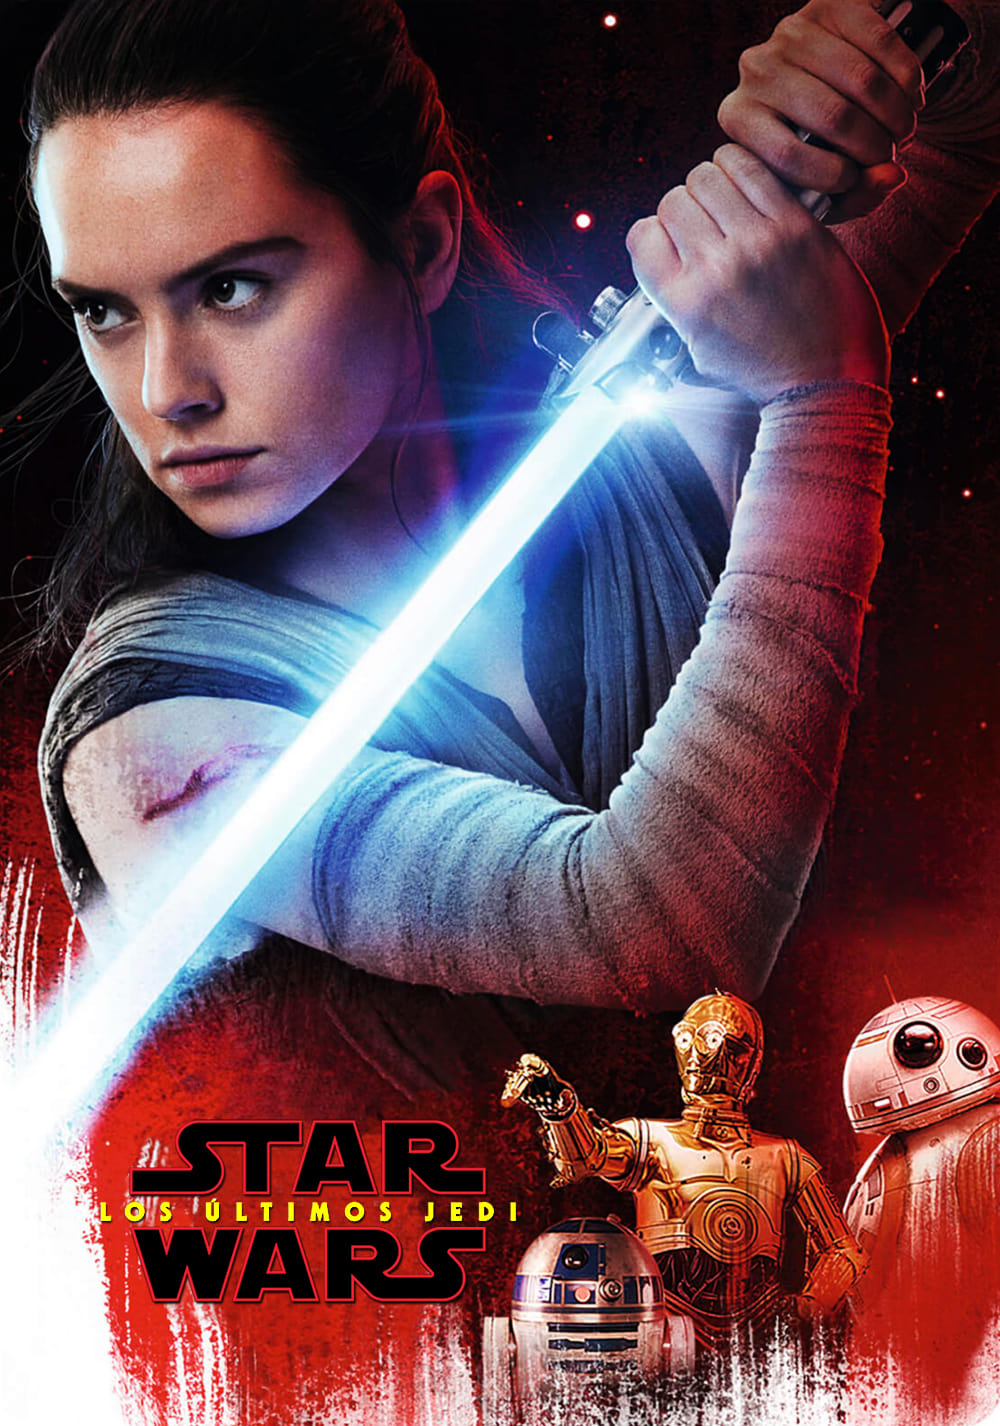 Star Wars Episodio 8 - Los Ultimos Jedi (2017) HD 720P LATINO/INGLES